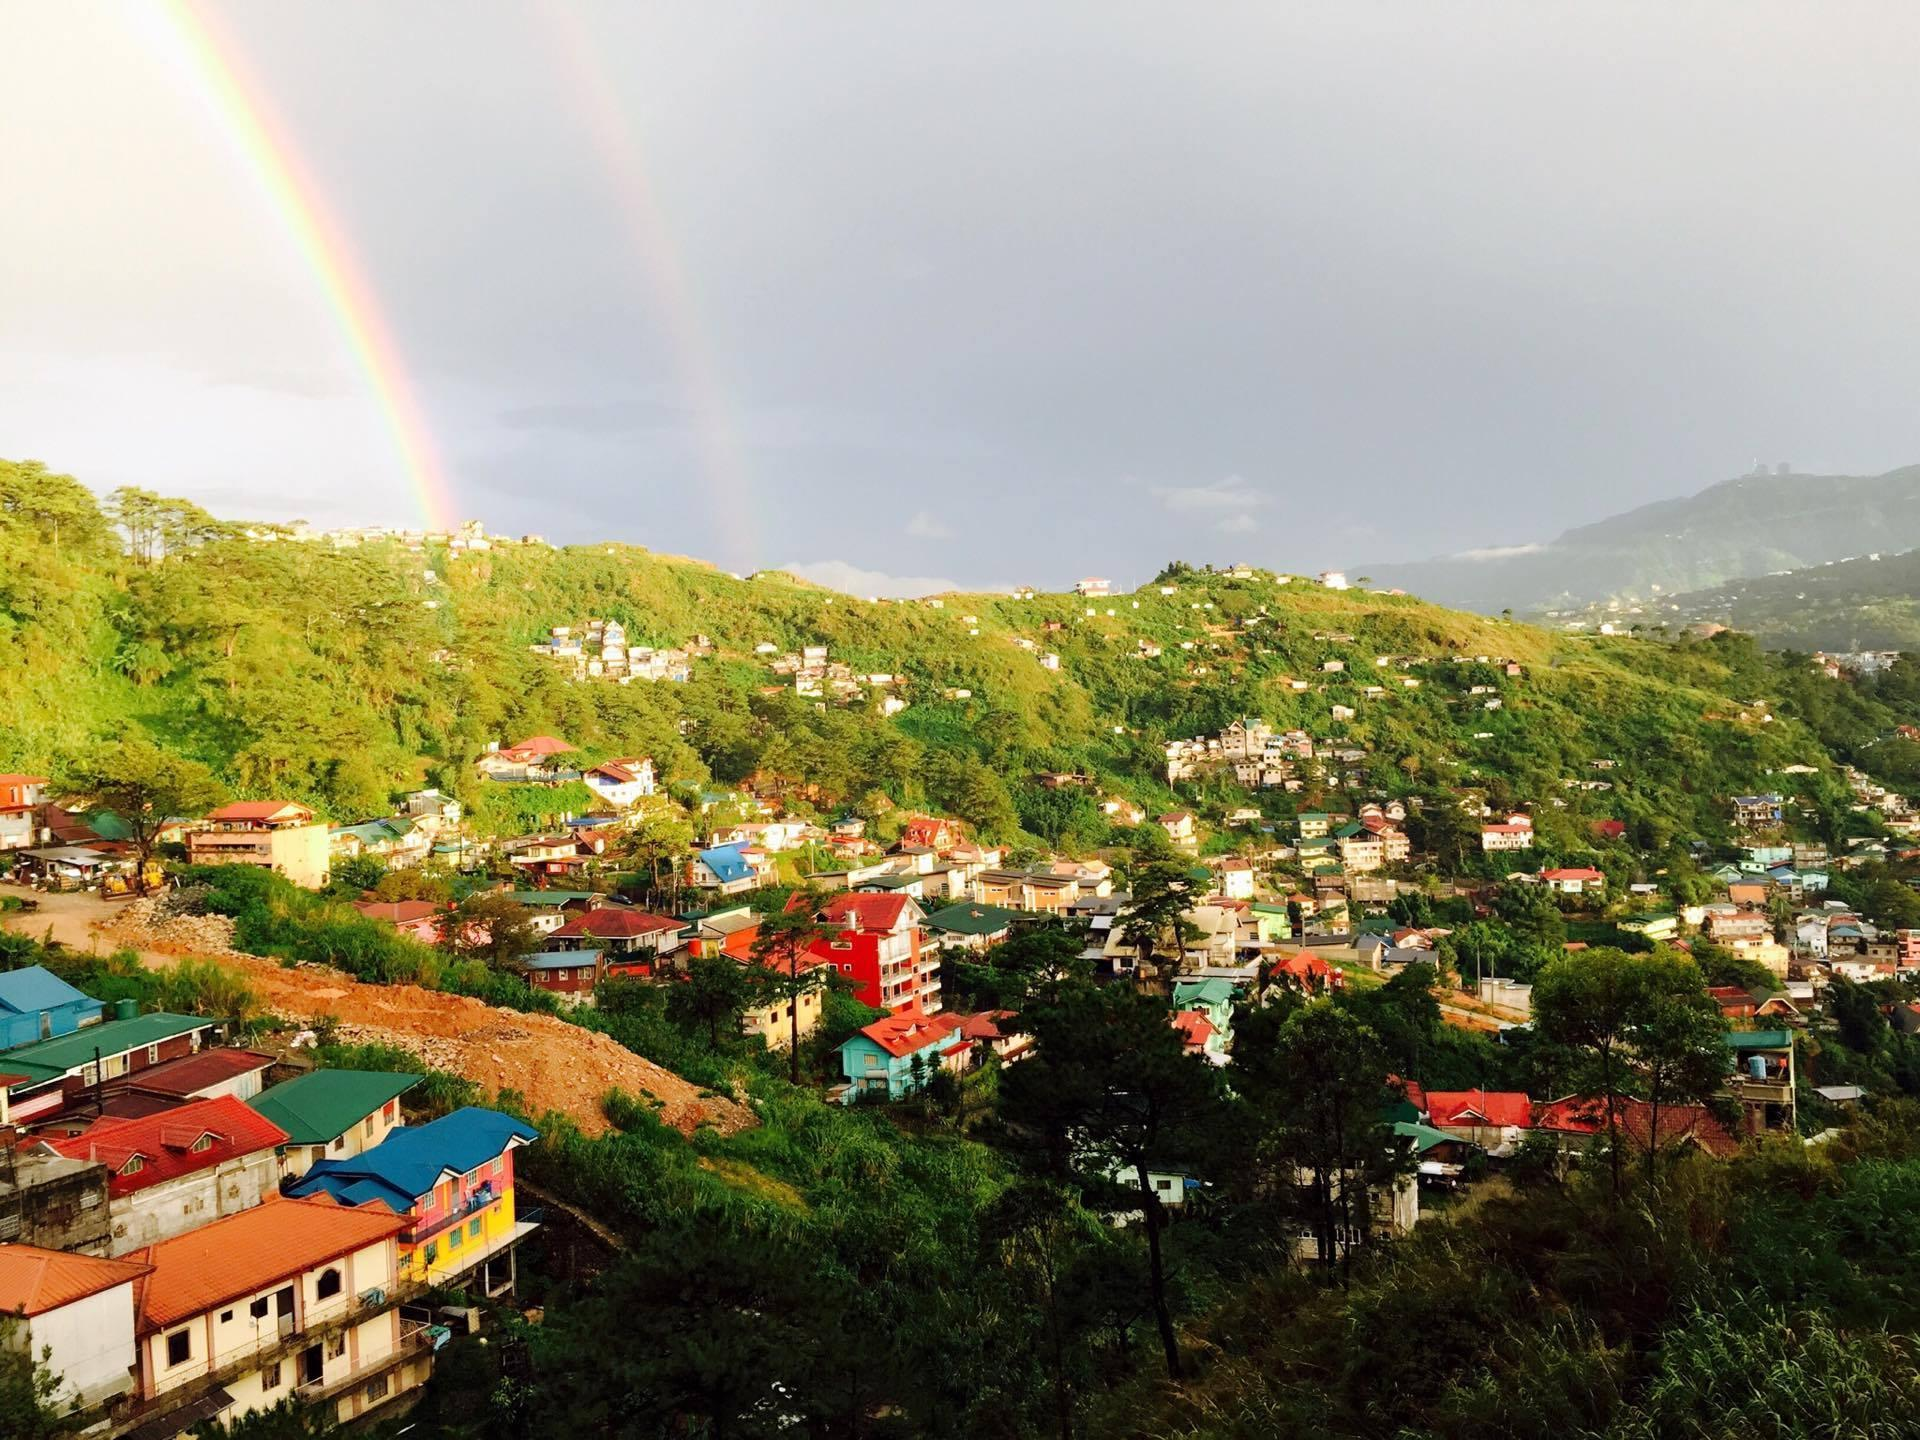 Shangrila Mountain View Transient